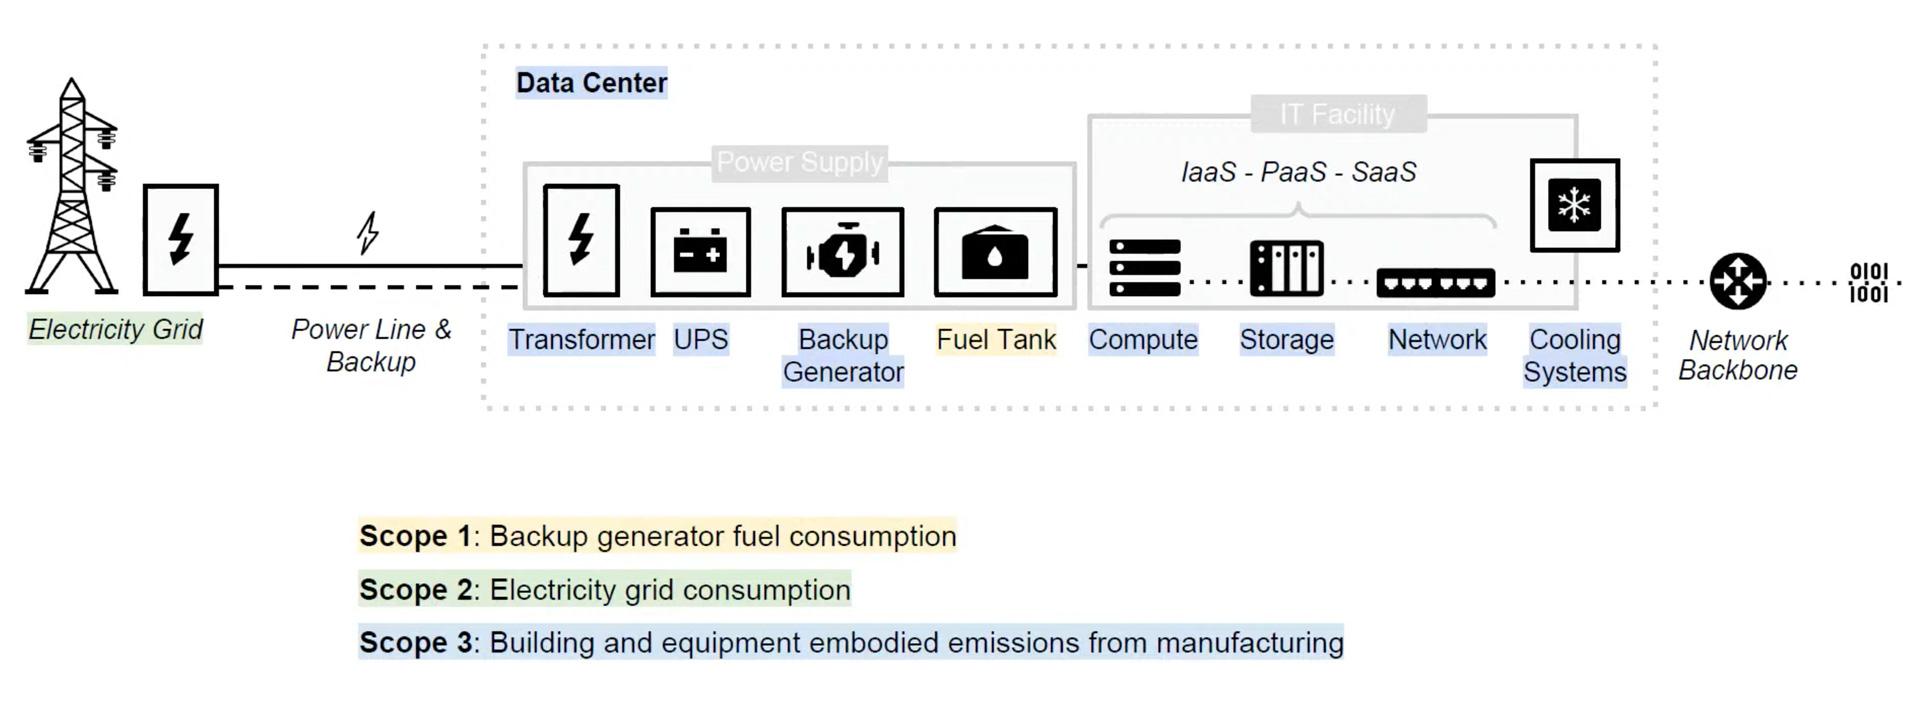 data center emission scopes